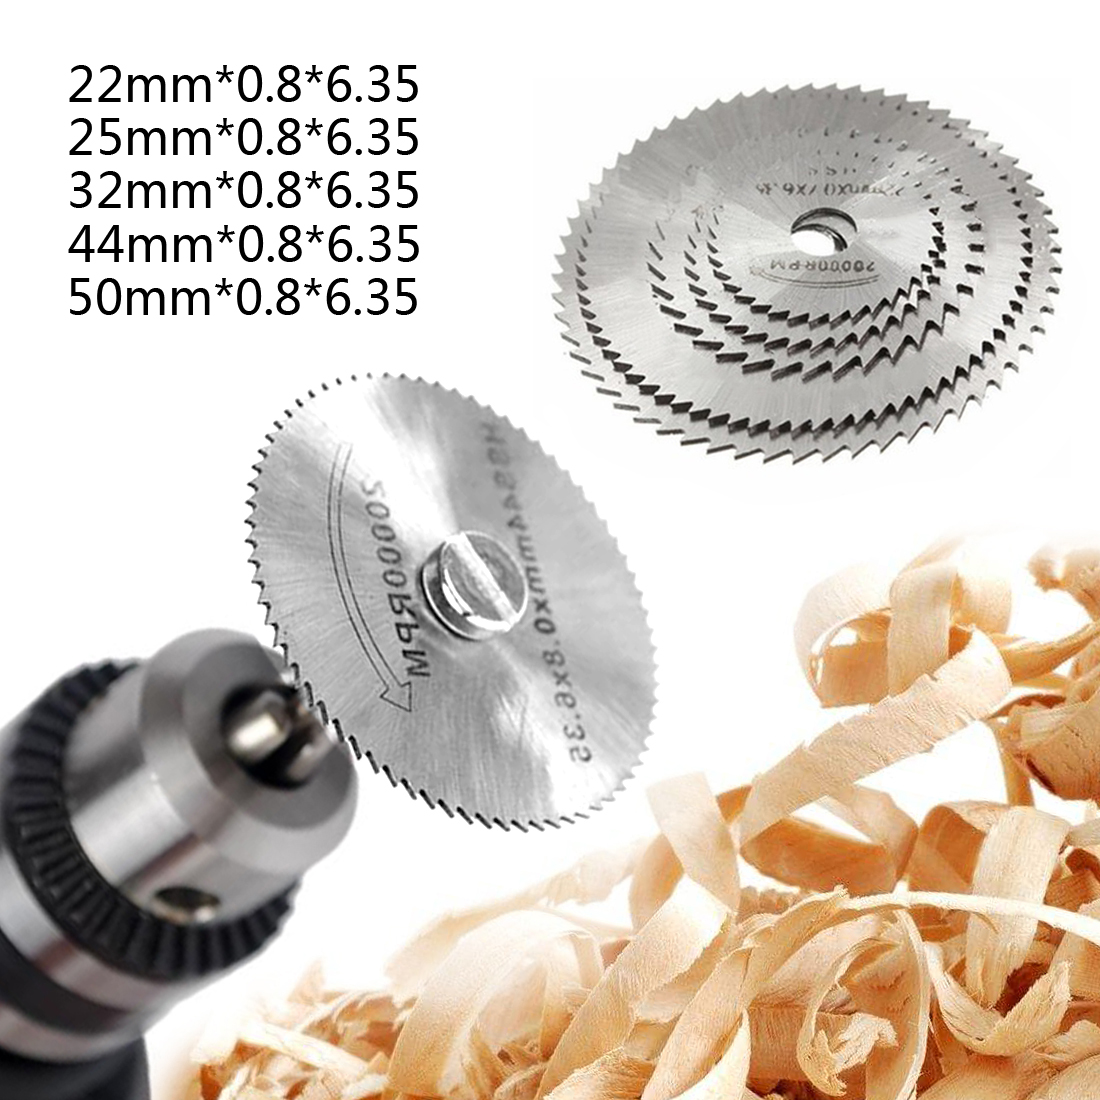 22-50mm Mini HSS Circular Saw Blade Jig Saw Rotary Tool For Dremel Metal Cutter Power Tool Set Wood Cutting Discs Drill Mandrel